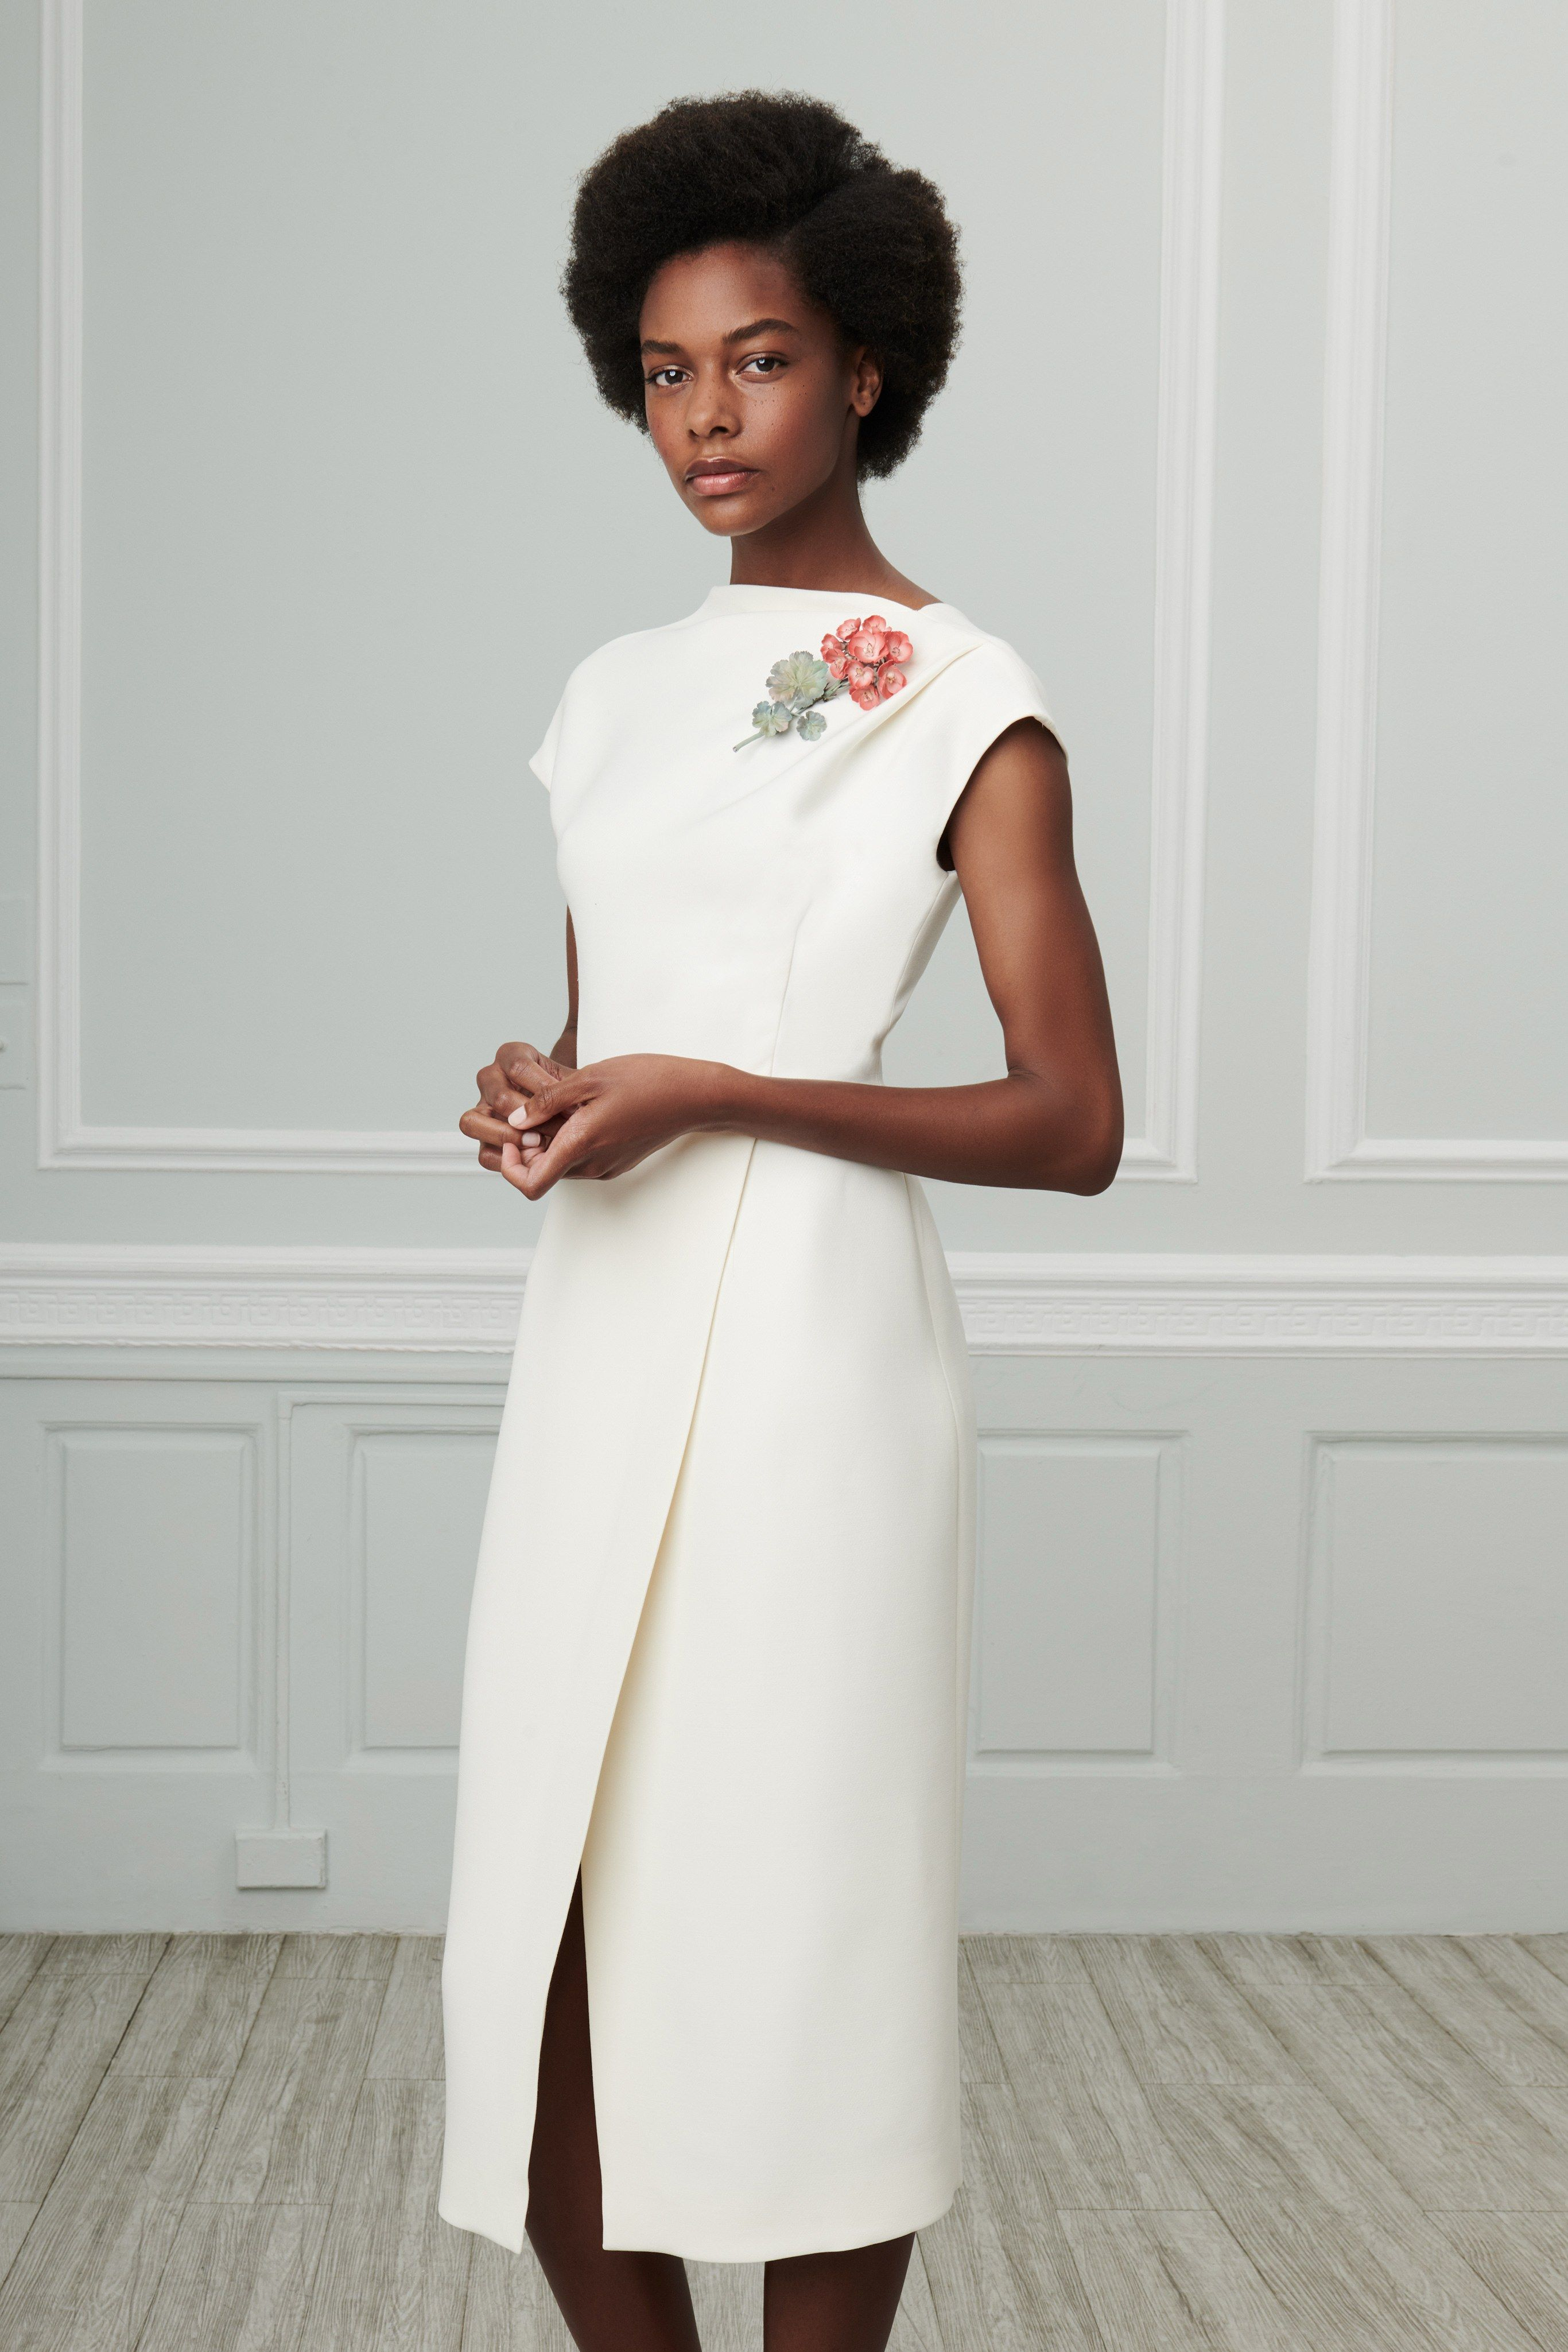 3cda2331b25f8 Oscar de la Renta Resort 2019 New York Collection - Vogue